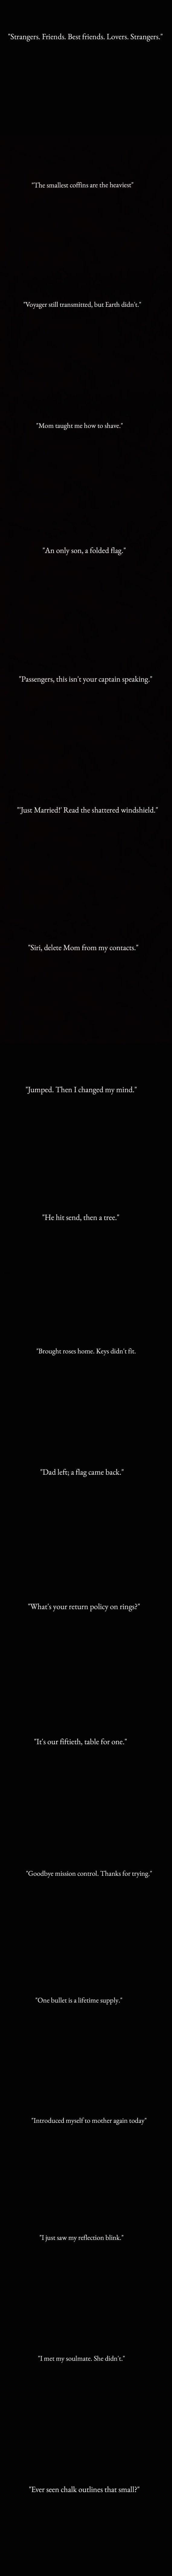 One liner sad stories